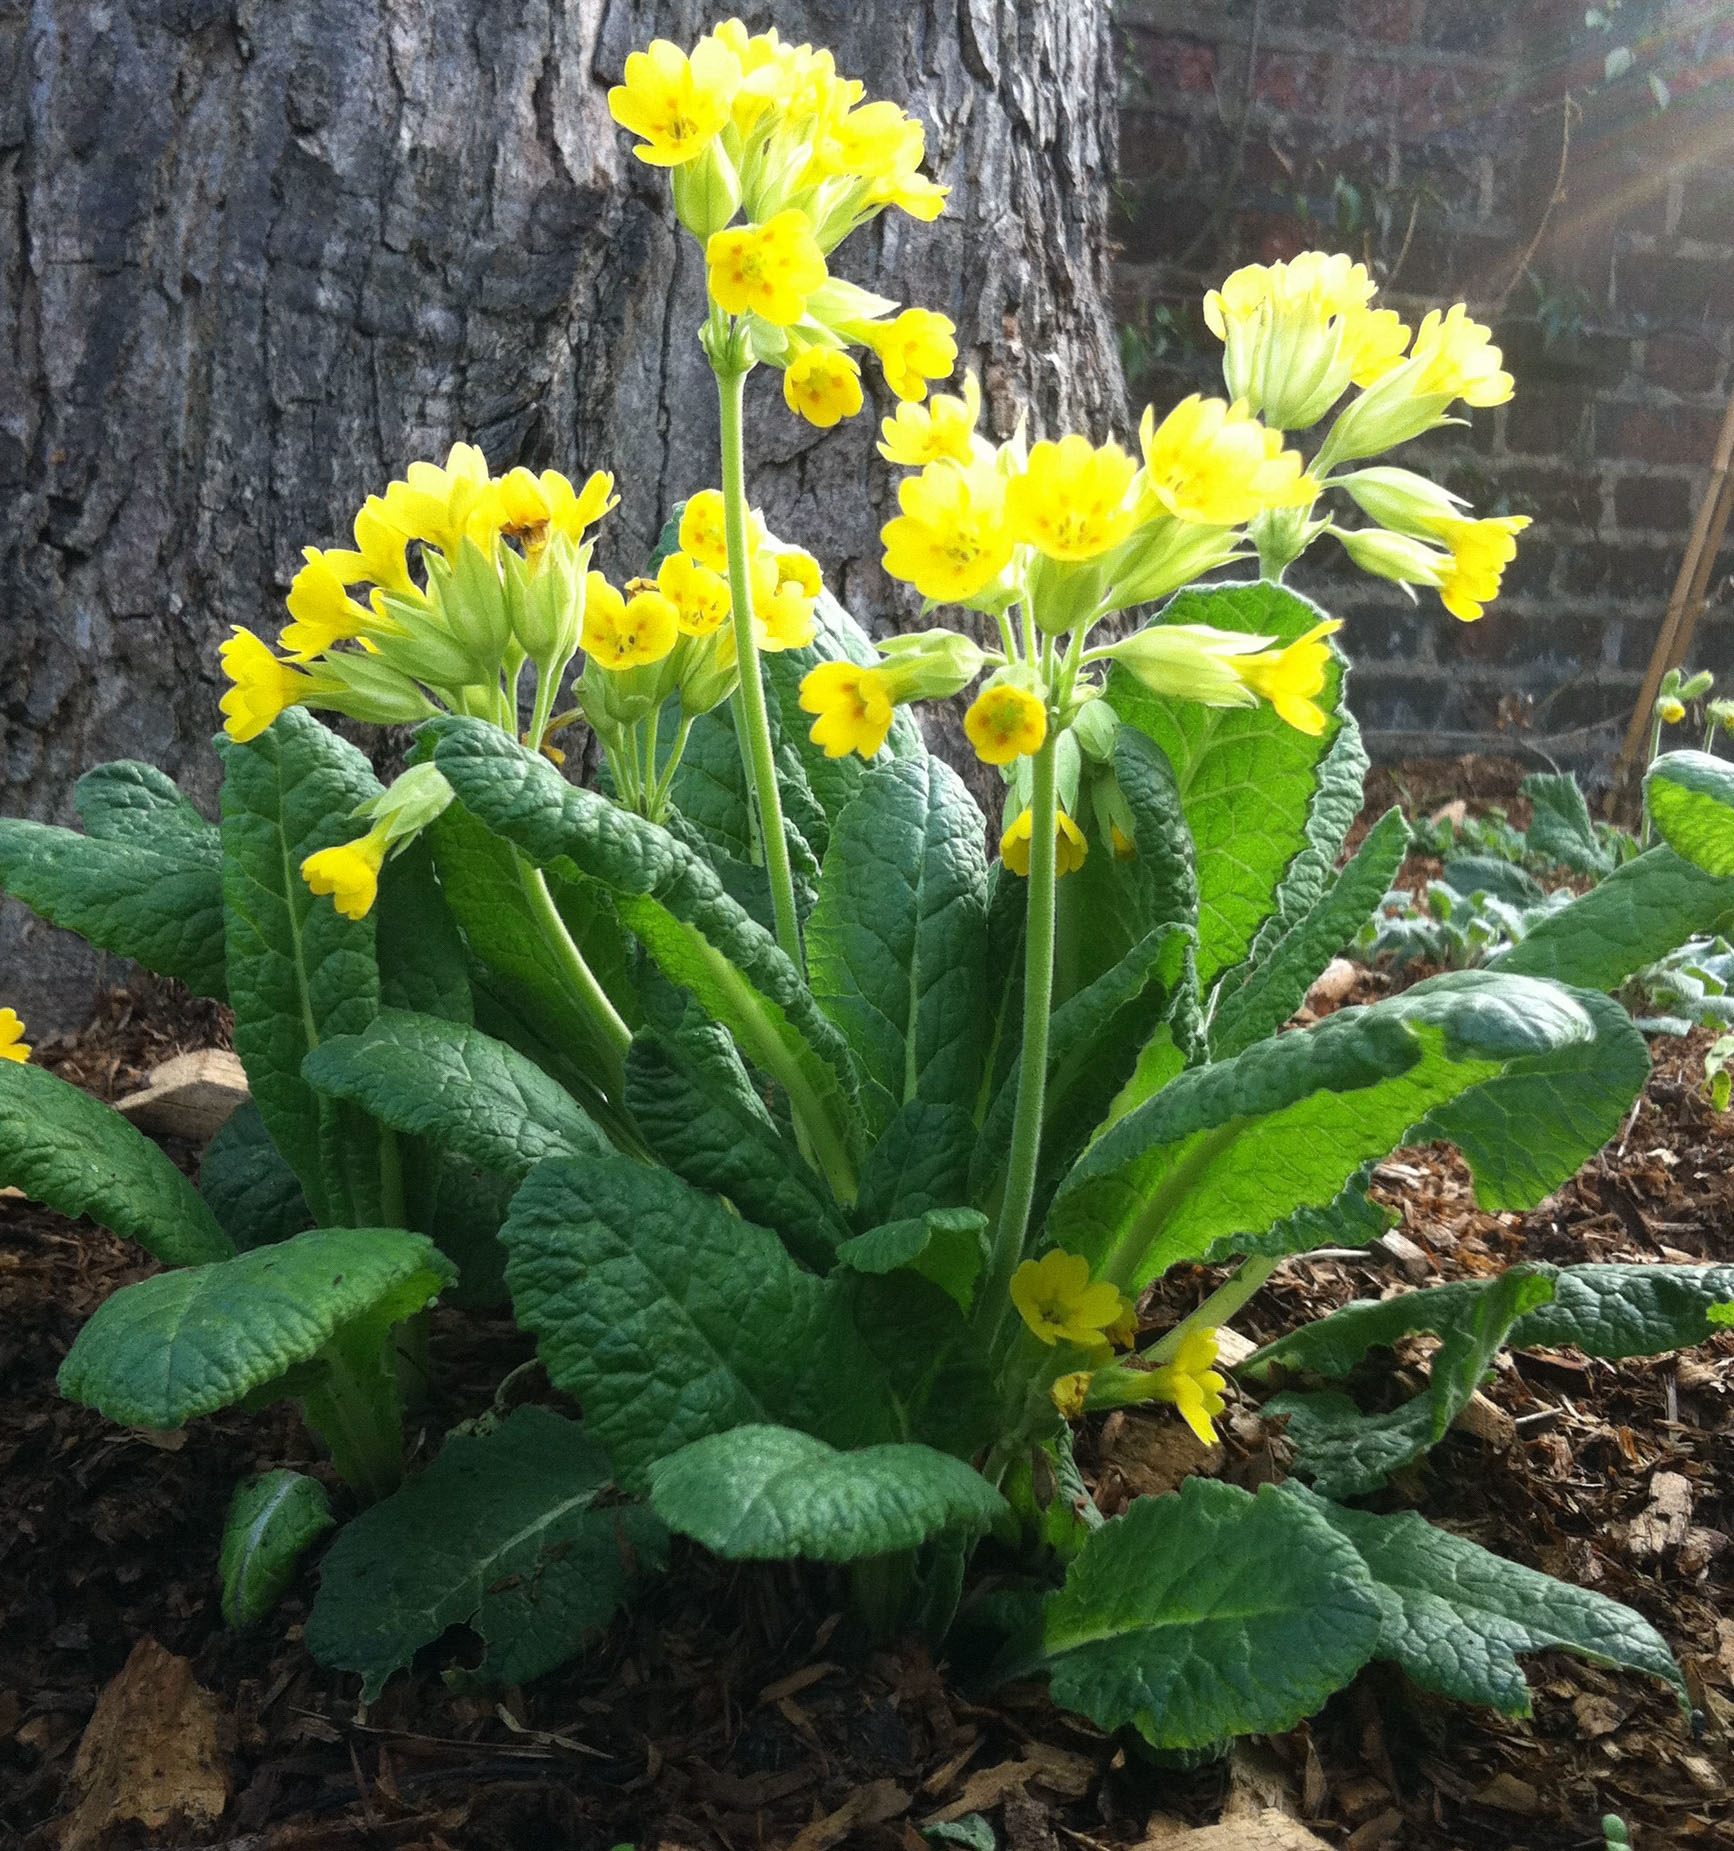 I più bei fiori di primavera - Fiori in giardino - I fiori più belli di prima...